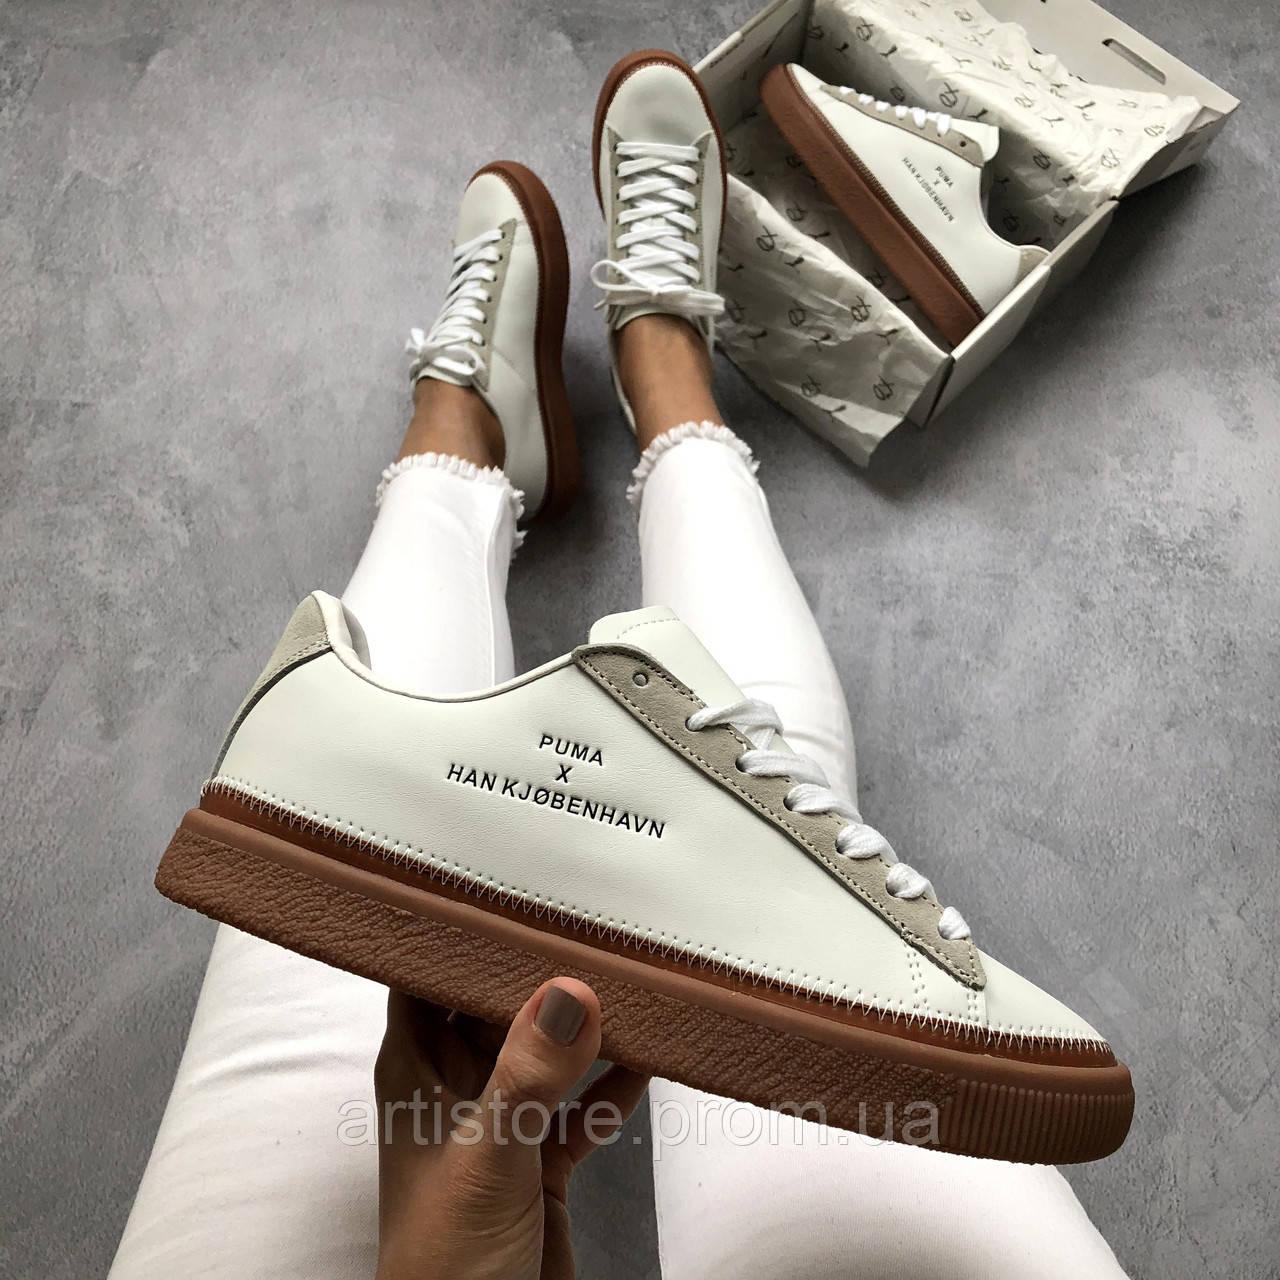 Кроссовки Puma x Han Kjobenhavn Clyde Stitched White with brown Белые с коричневым